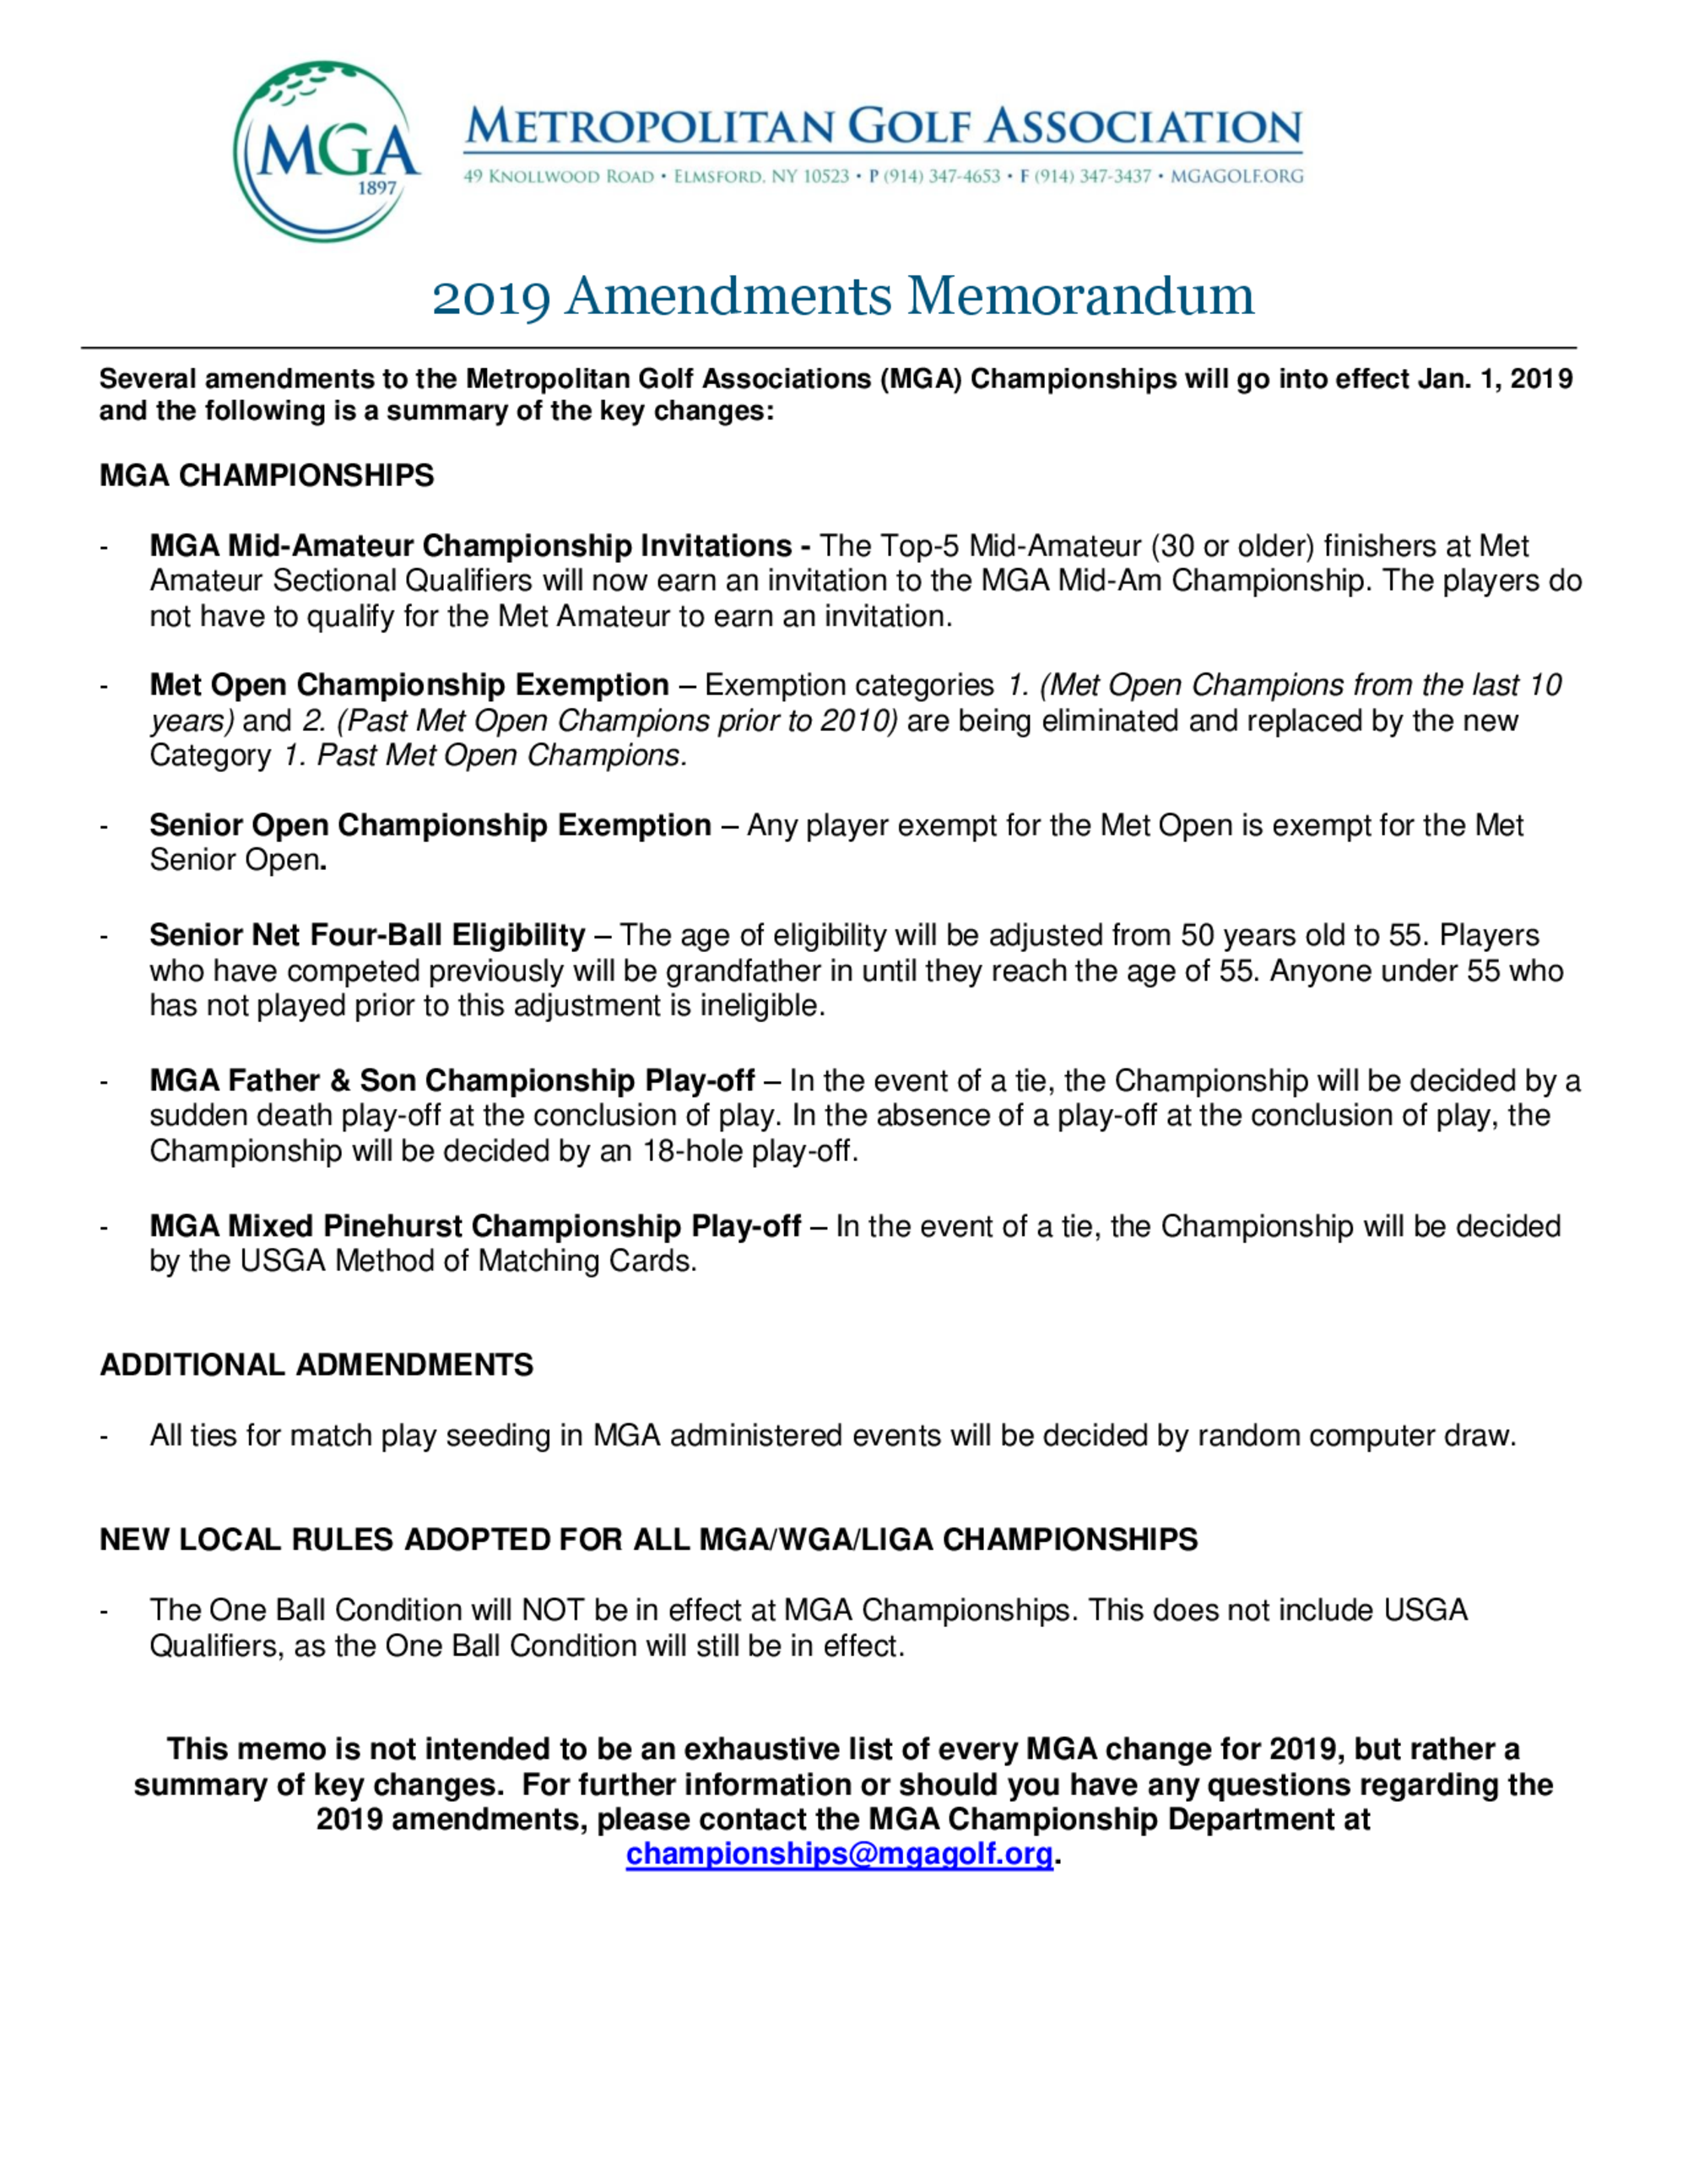 Mga 2019 amendments memorandum 1